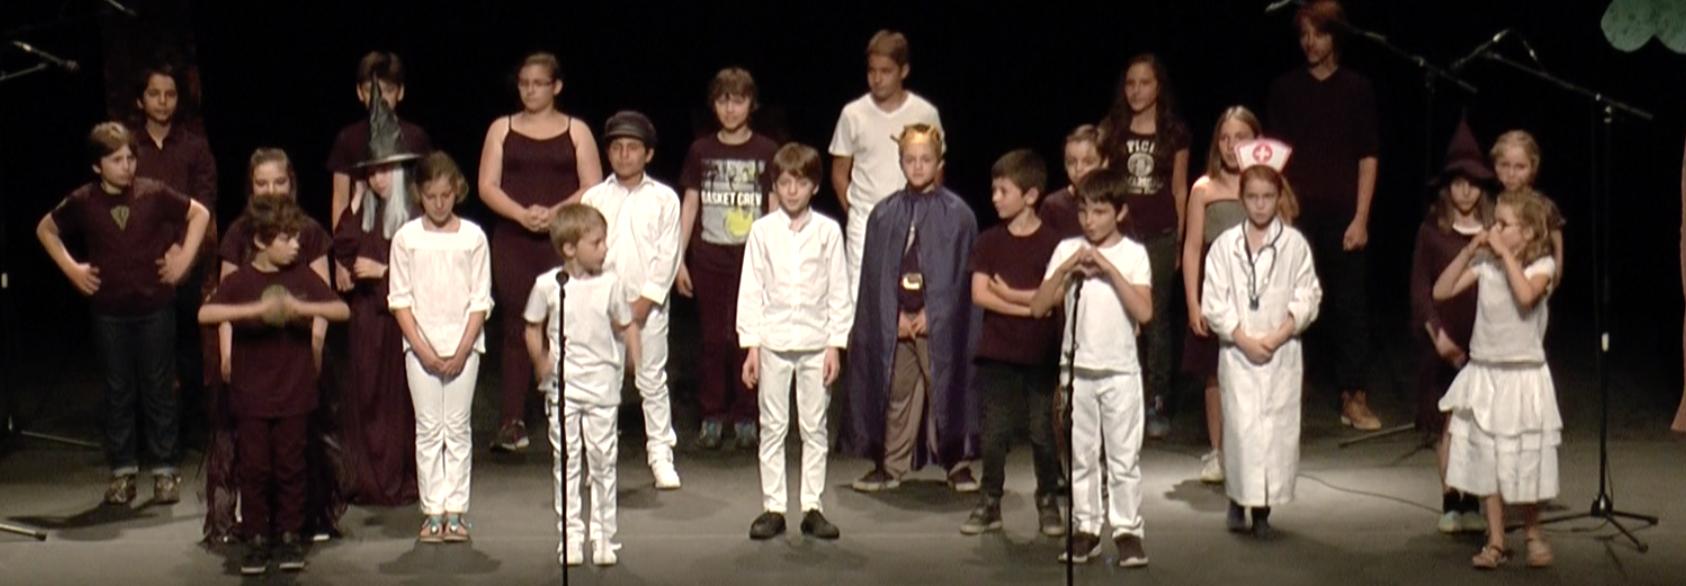 montessori international bordeaux english anglais theatre shakespeare 21